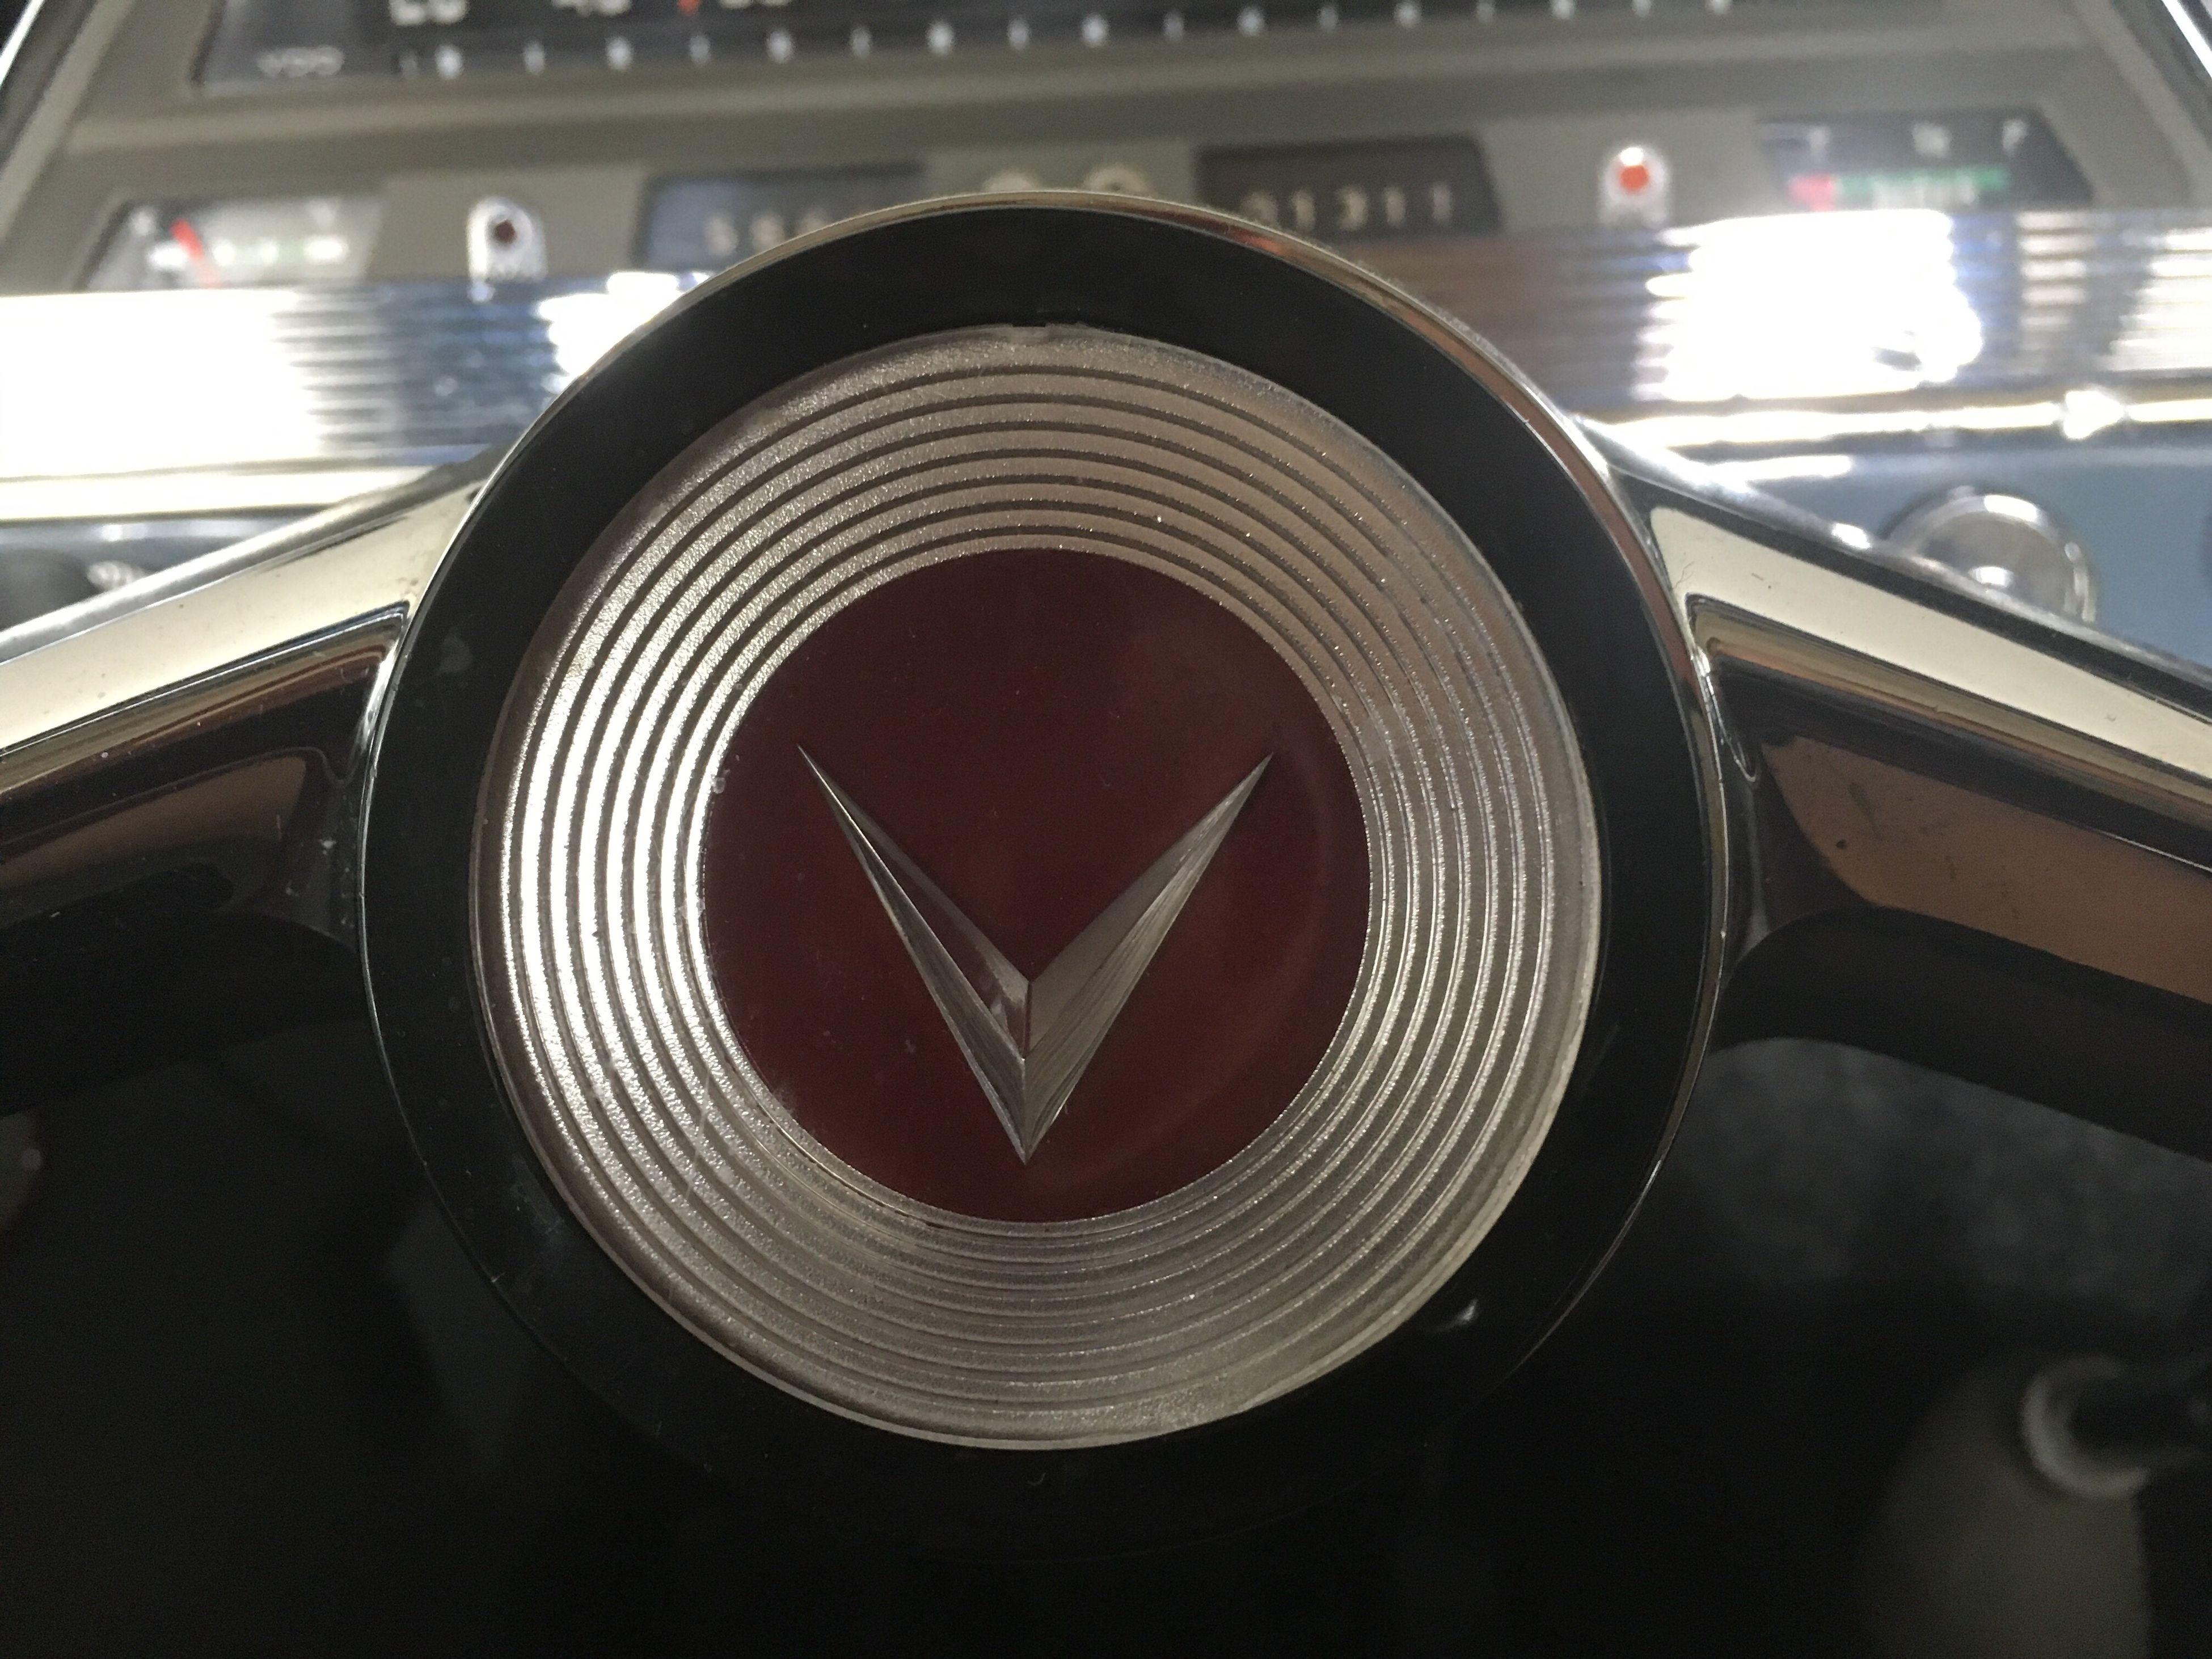 headlight, musical equipment, modern, focus on foreground